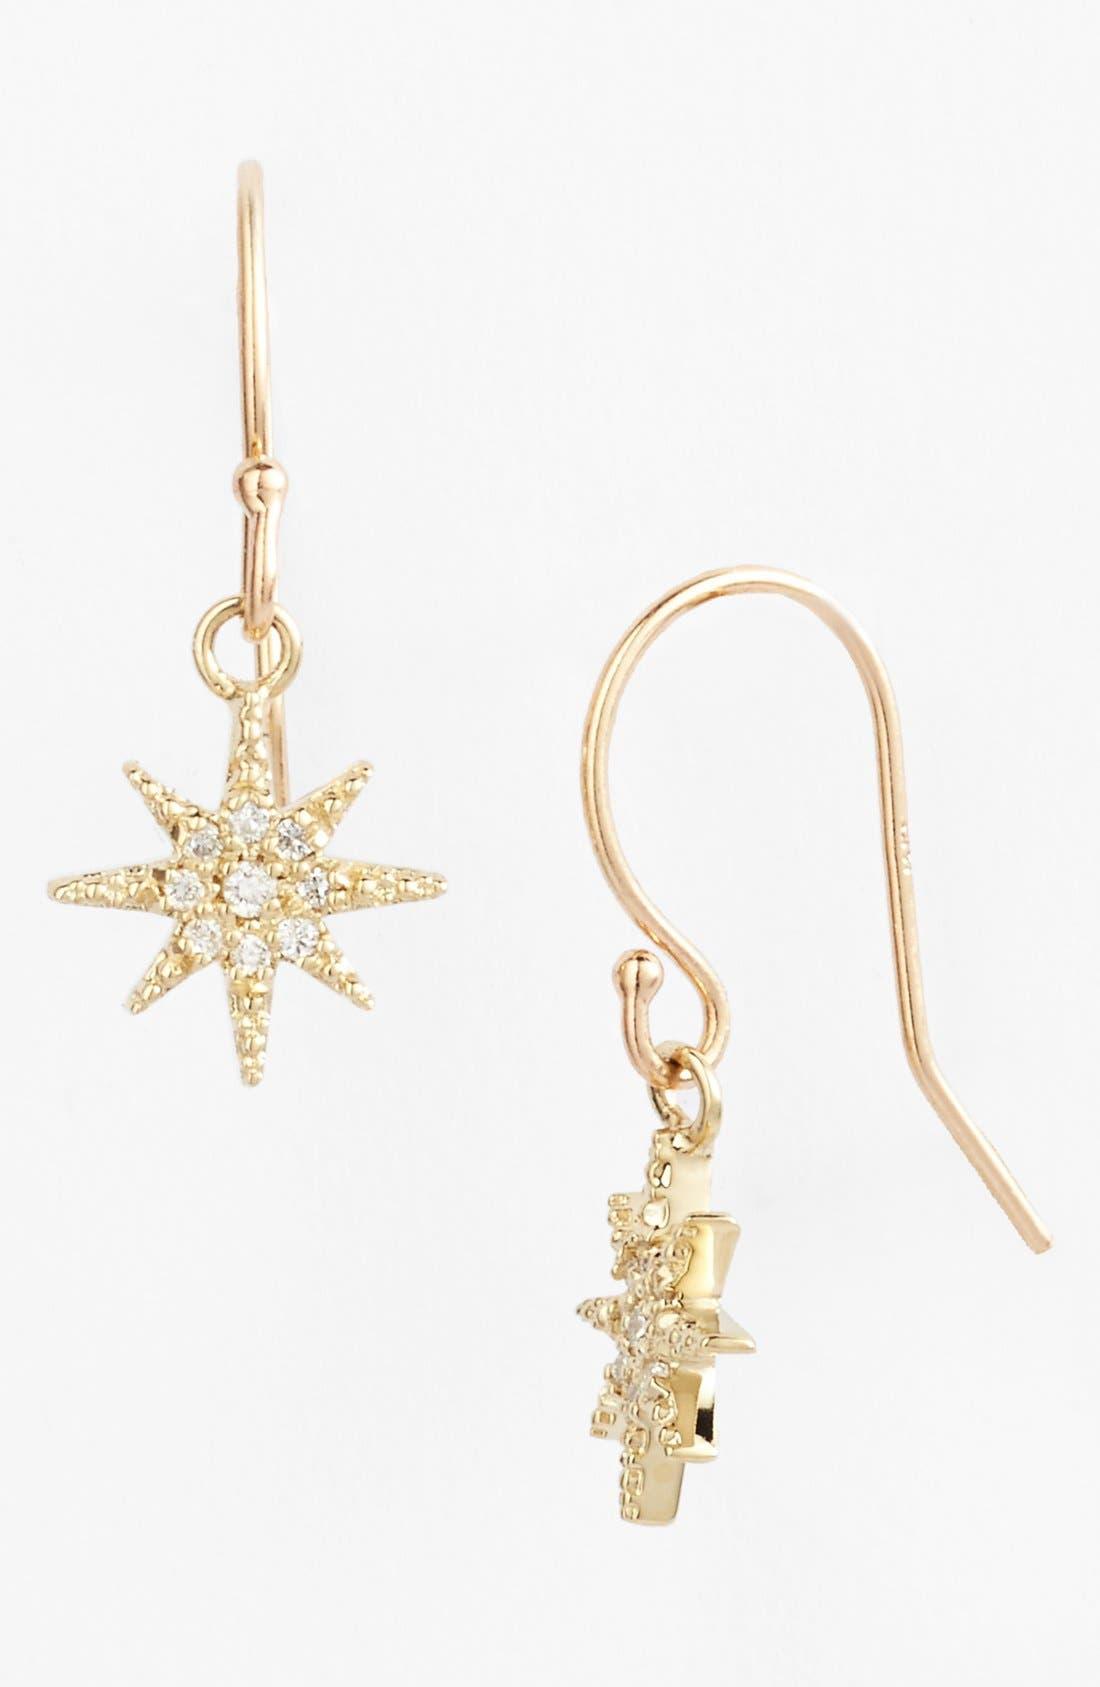 Main Image - Mizuki 'Icicles' Small Starburst Drop Earrings